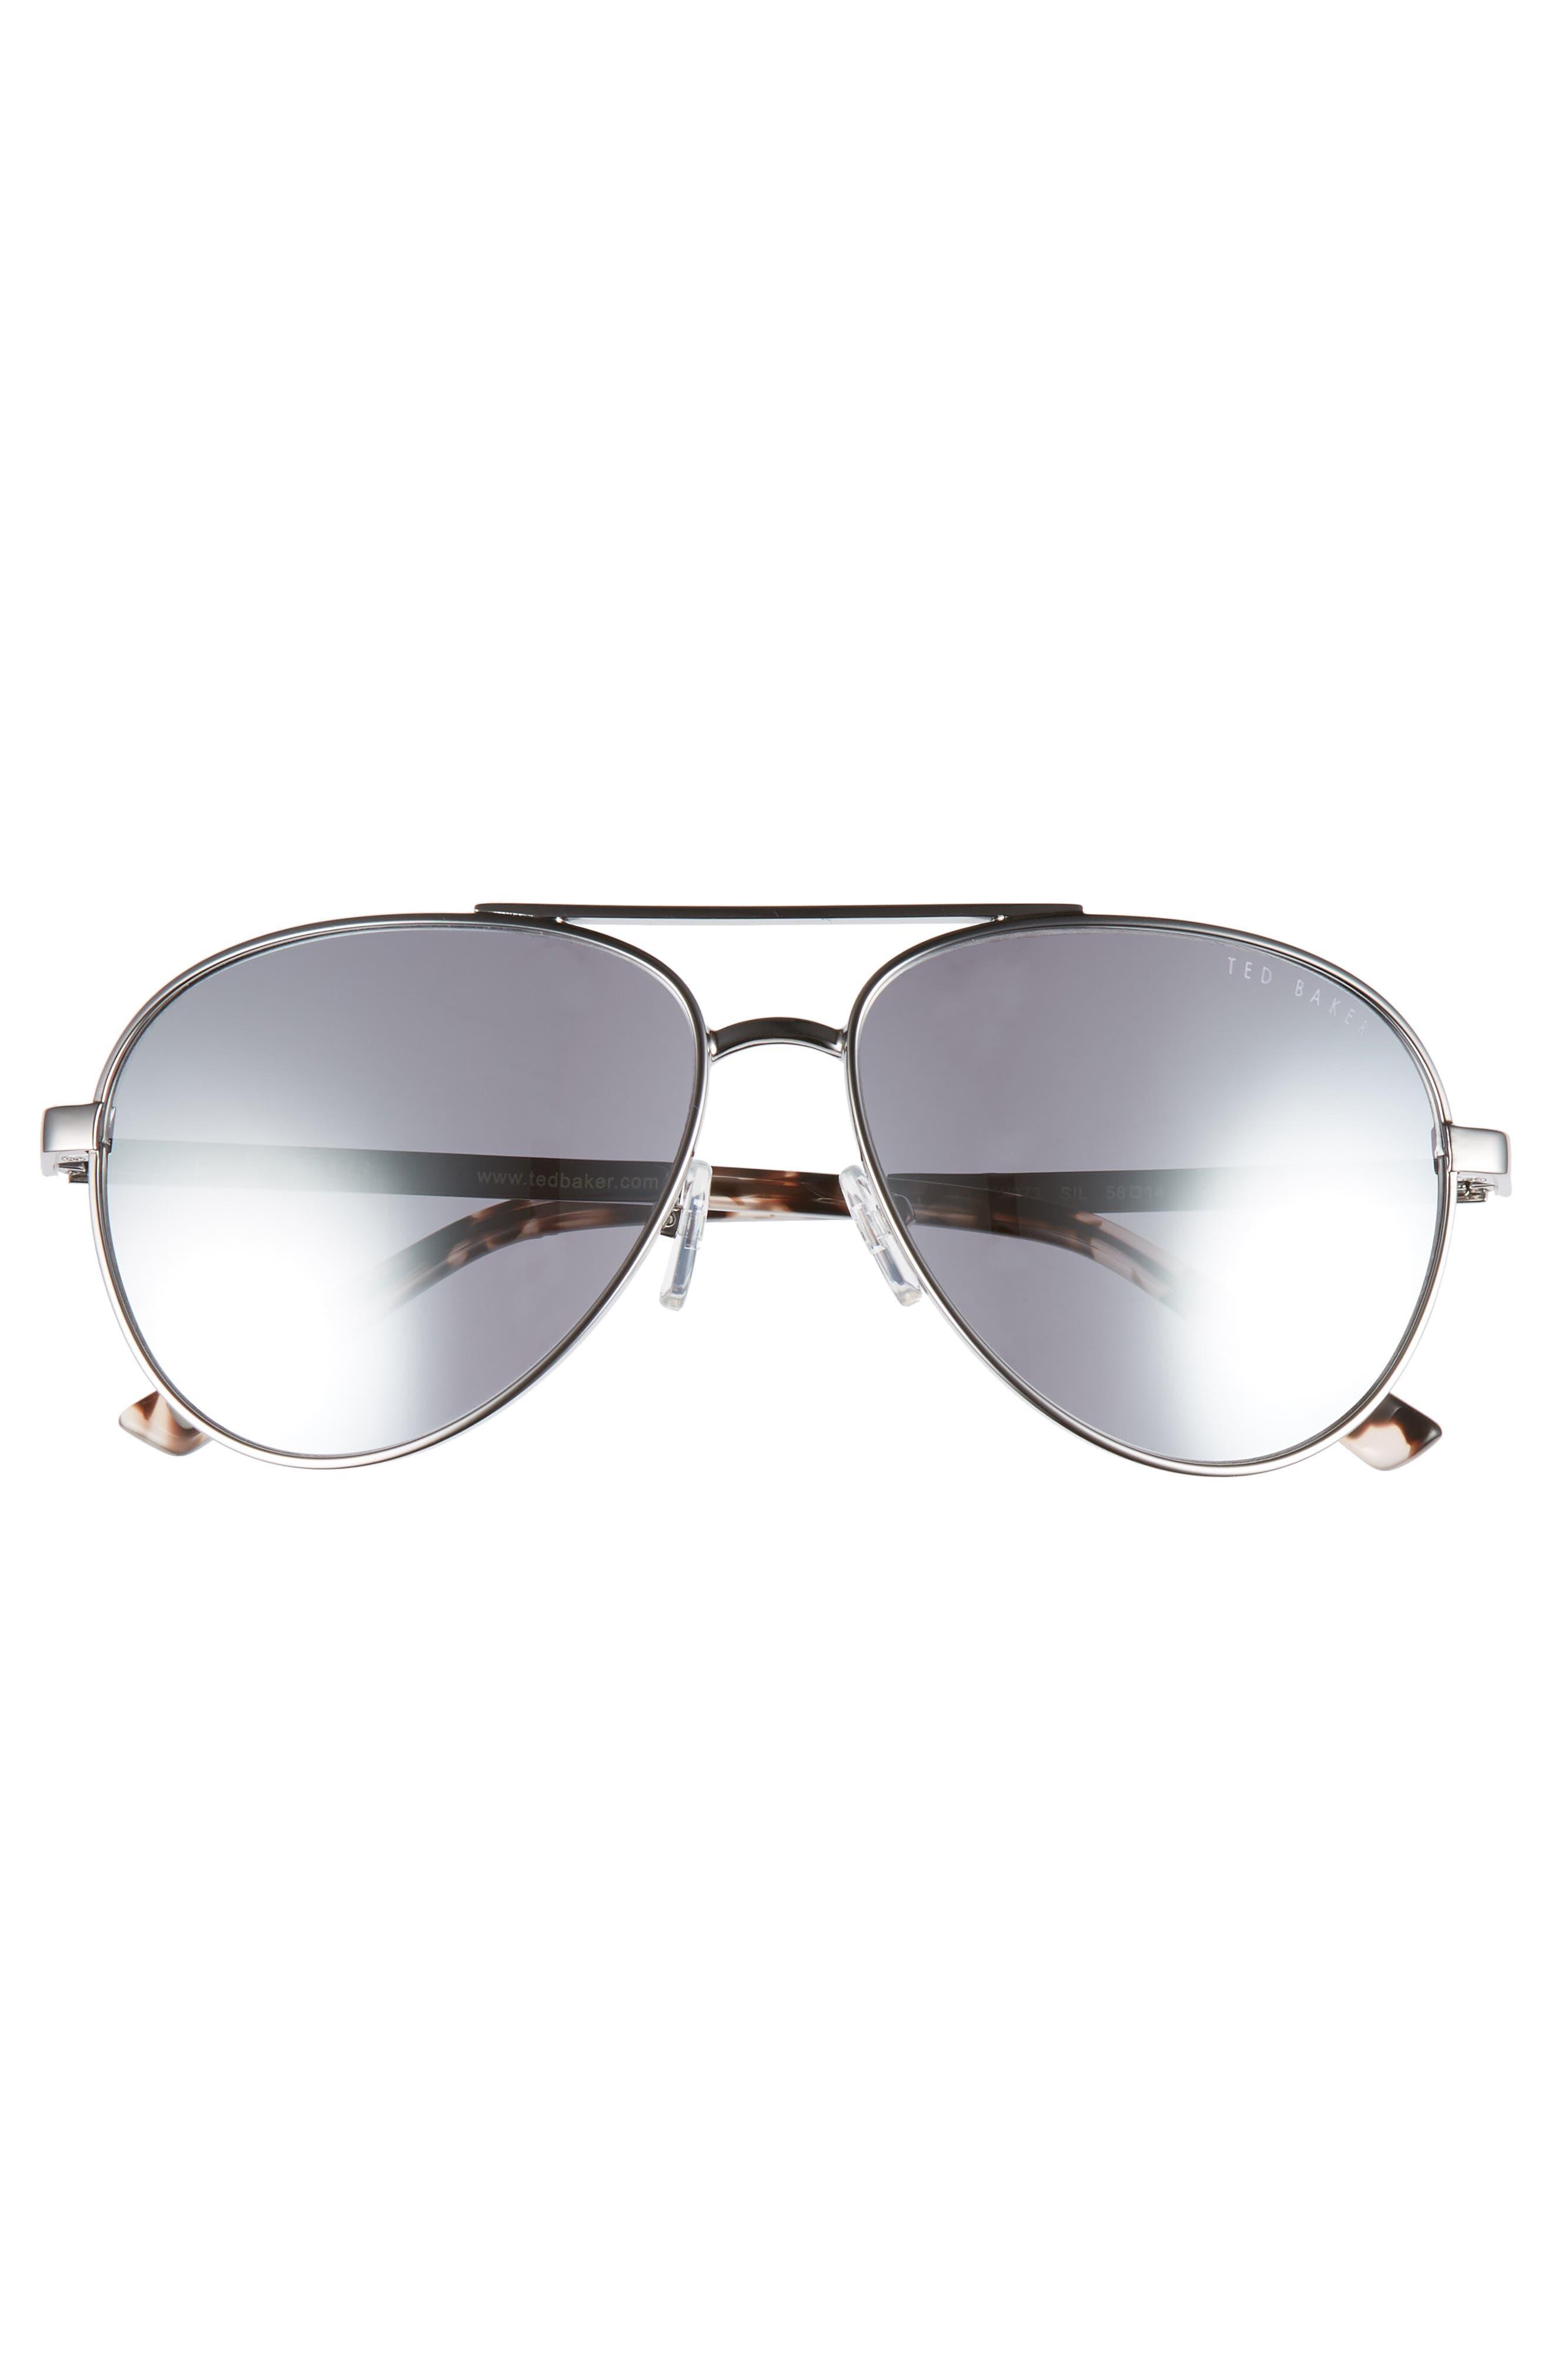 58mm Aviator Sunglasses,                             Alternate thumbnail 3, color,                             SILVER